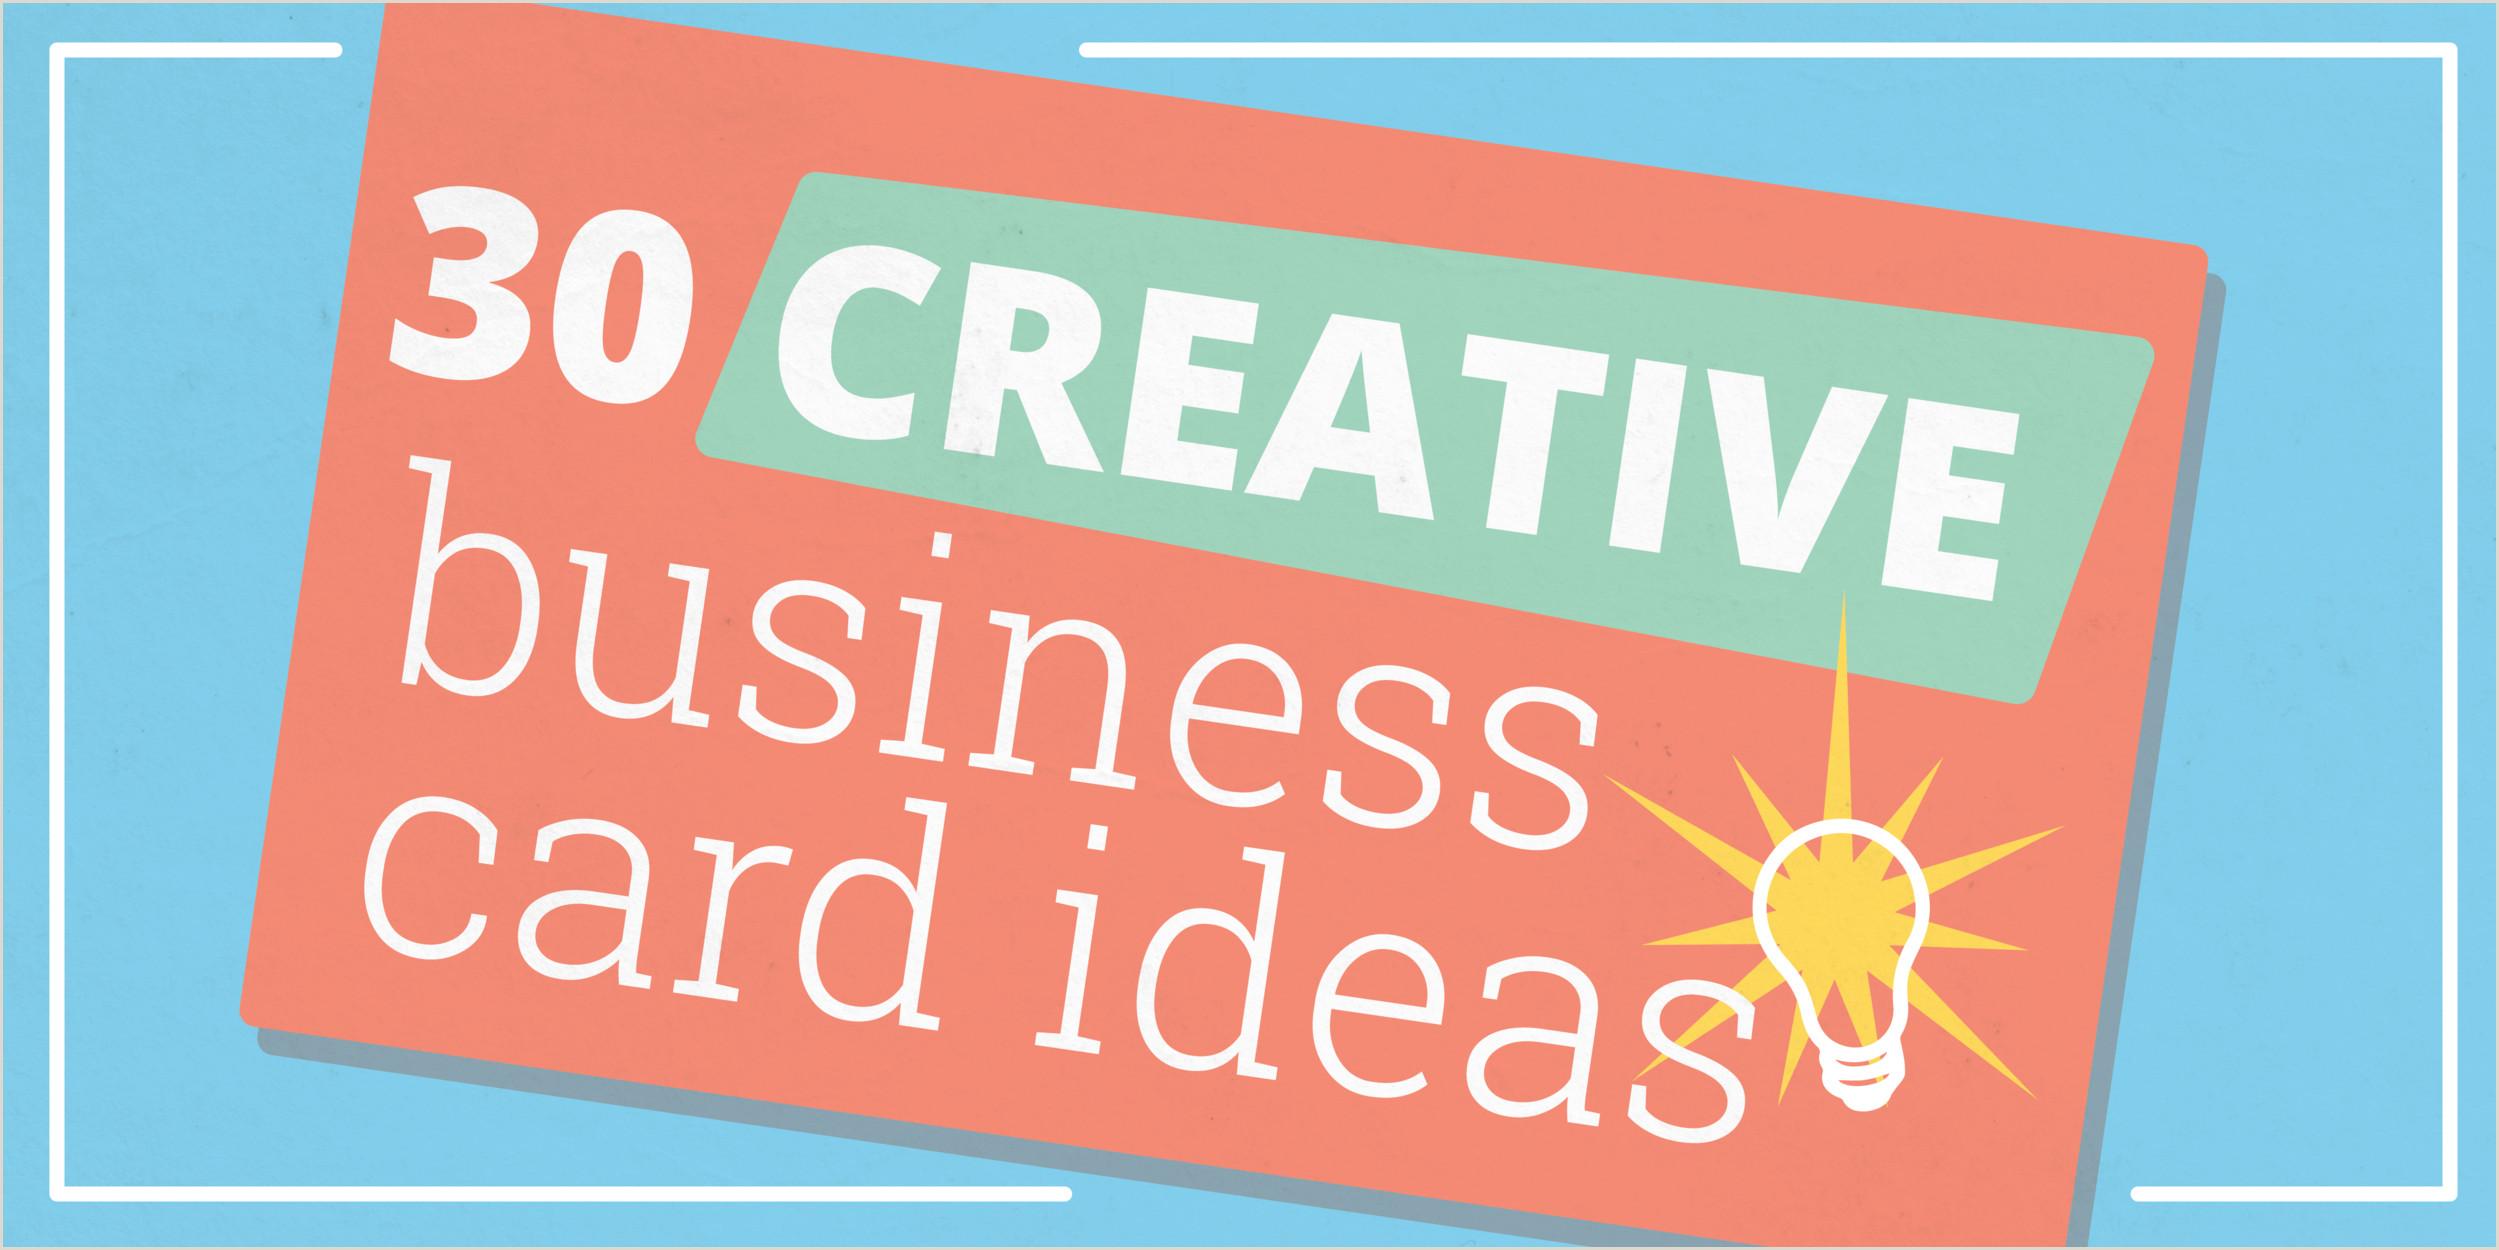 Ideas Business Cards 30 Creative Business Card Ideas & Designs